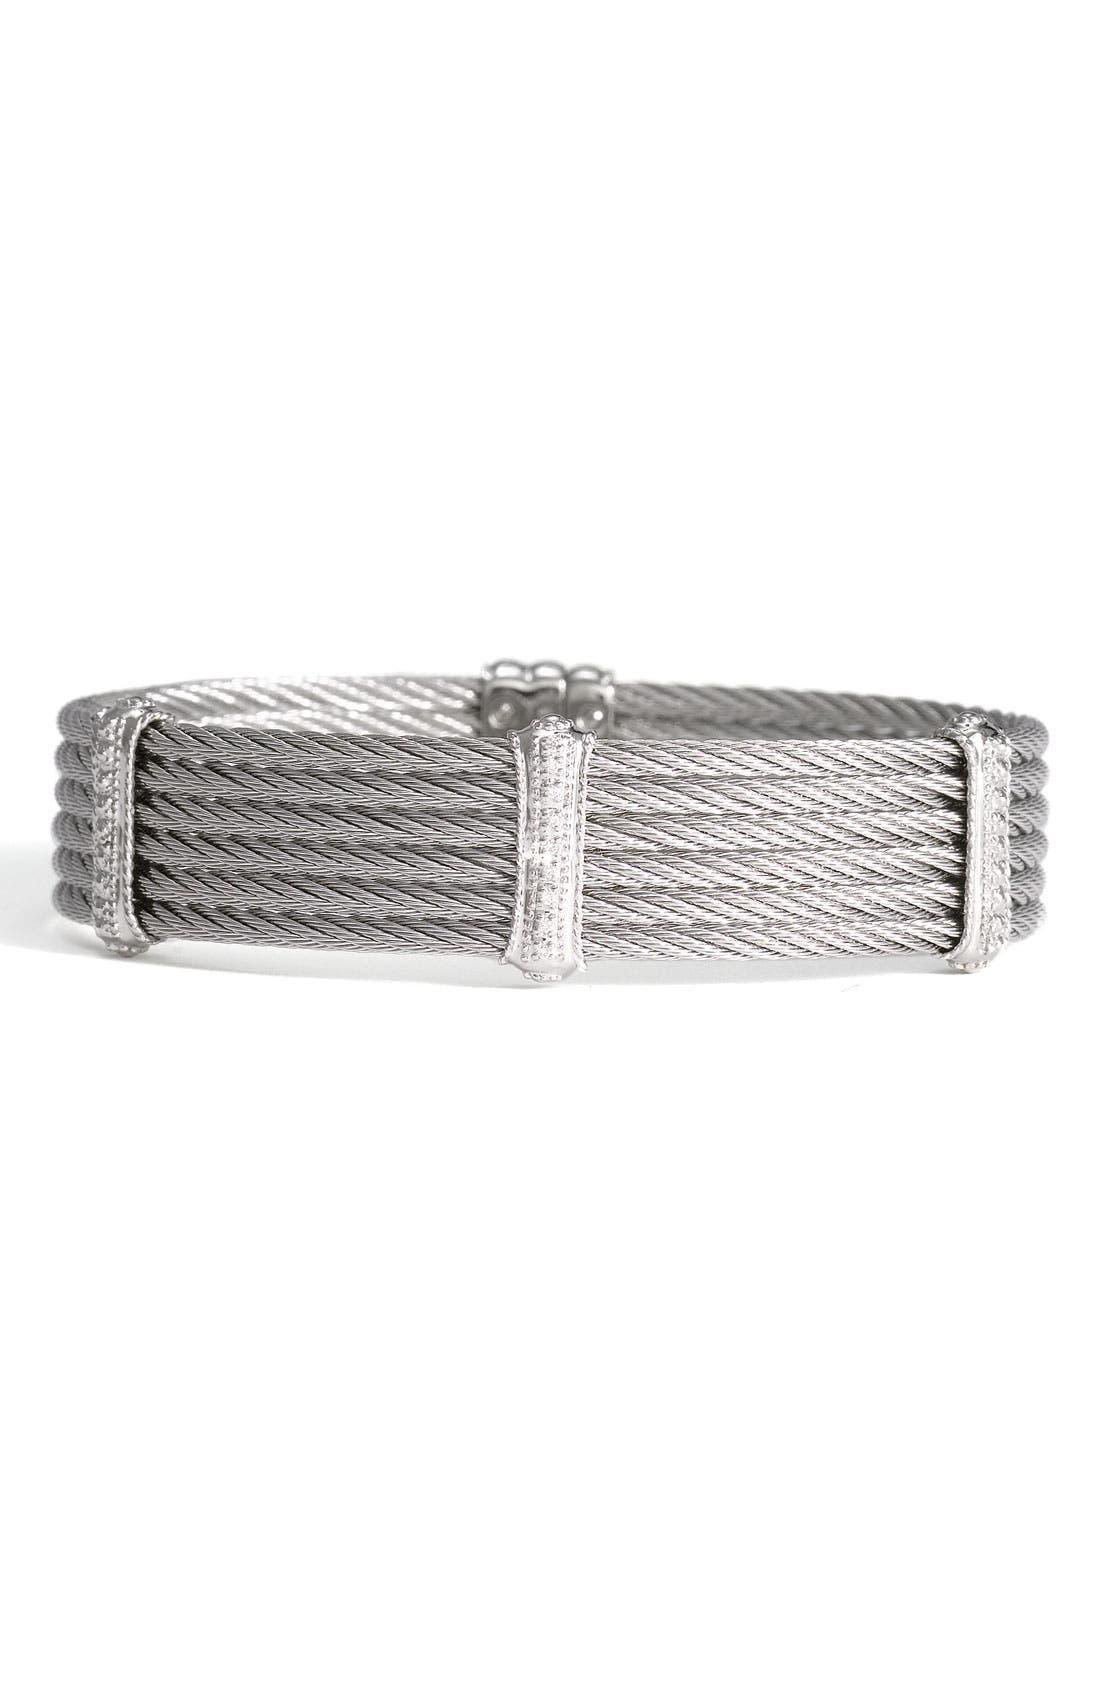 Main Image - ALOR® 6-Row Bracelet